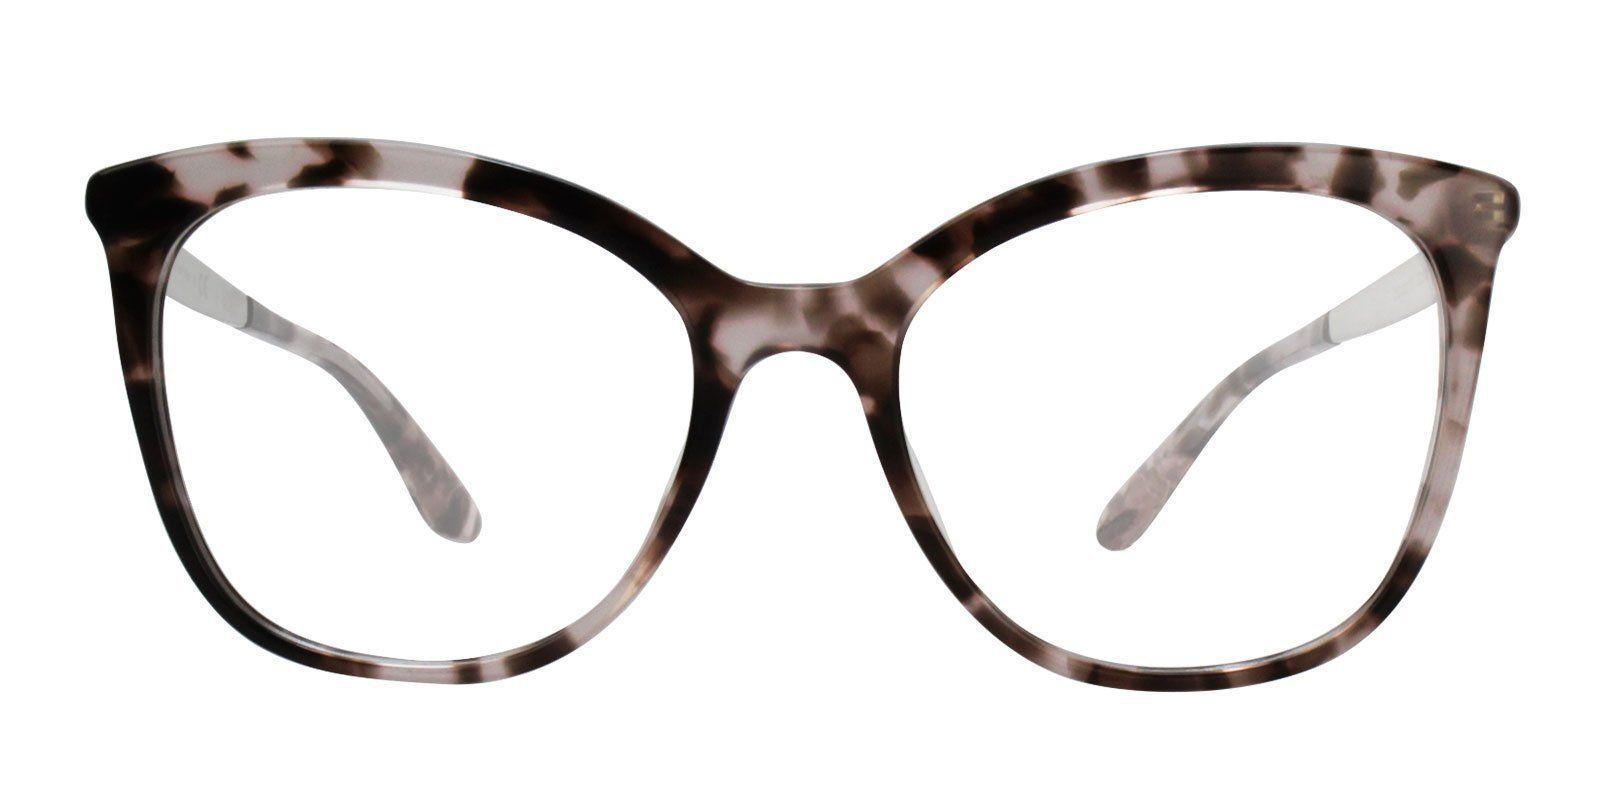 b6b59d7afac Dolce Gabbana - DG3278 Tortoise eyeglasses